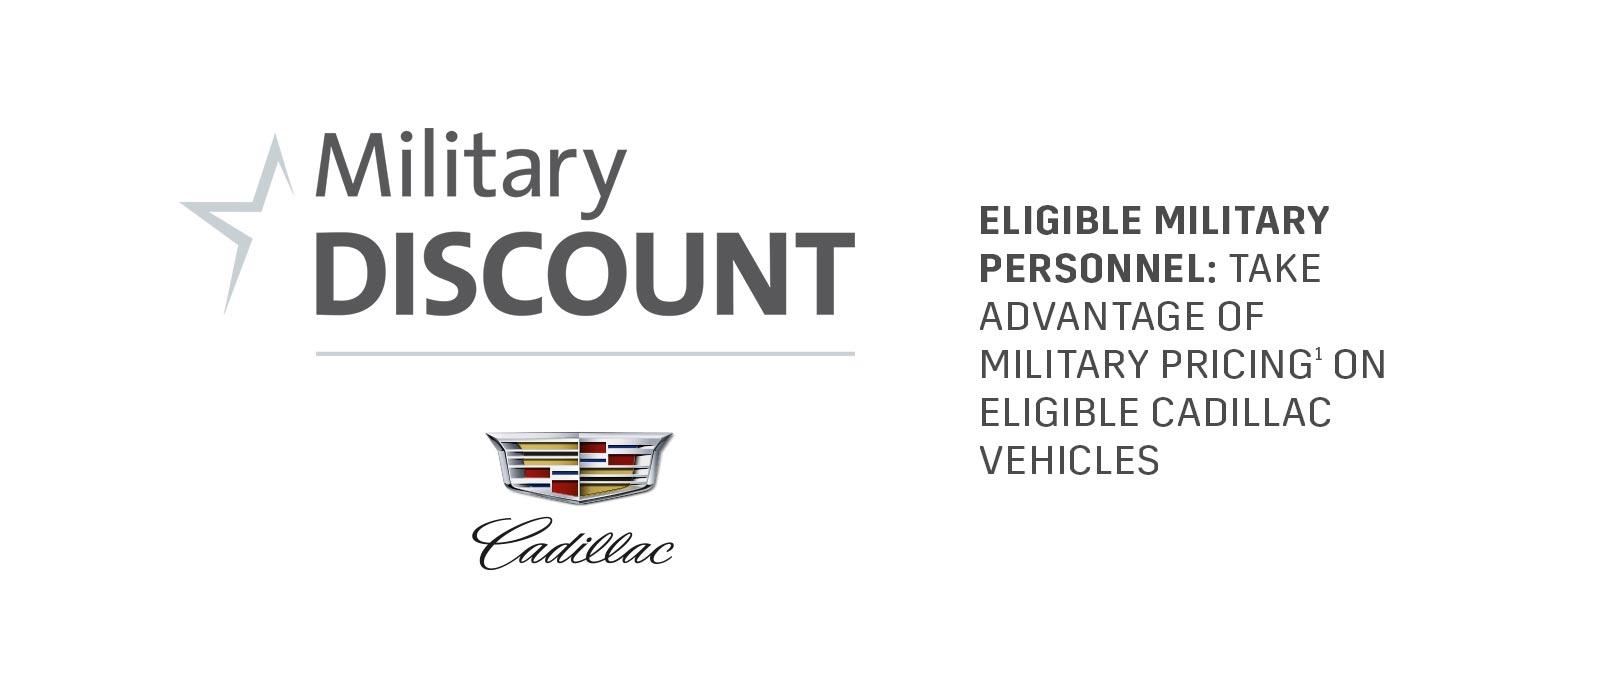 cadillac military discount in mt laurel nj serving cherry hill nj philadelphia pa. Black Bedroom Furniture Sets. Home Design Ideas